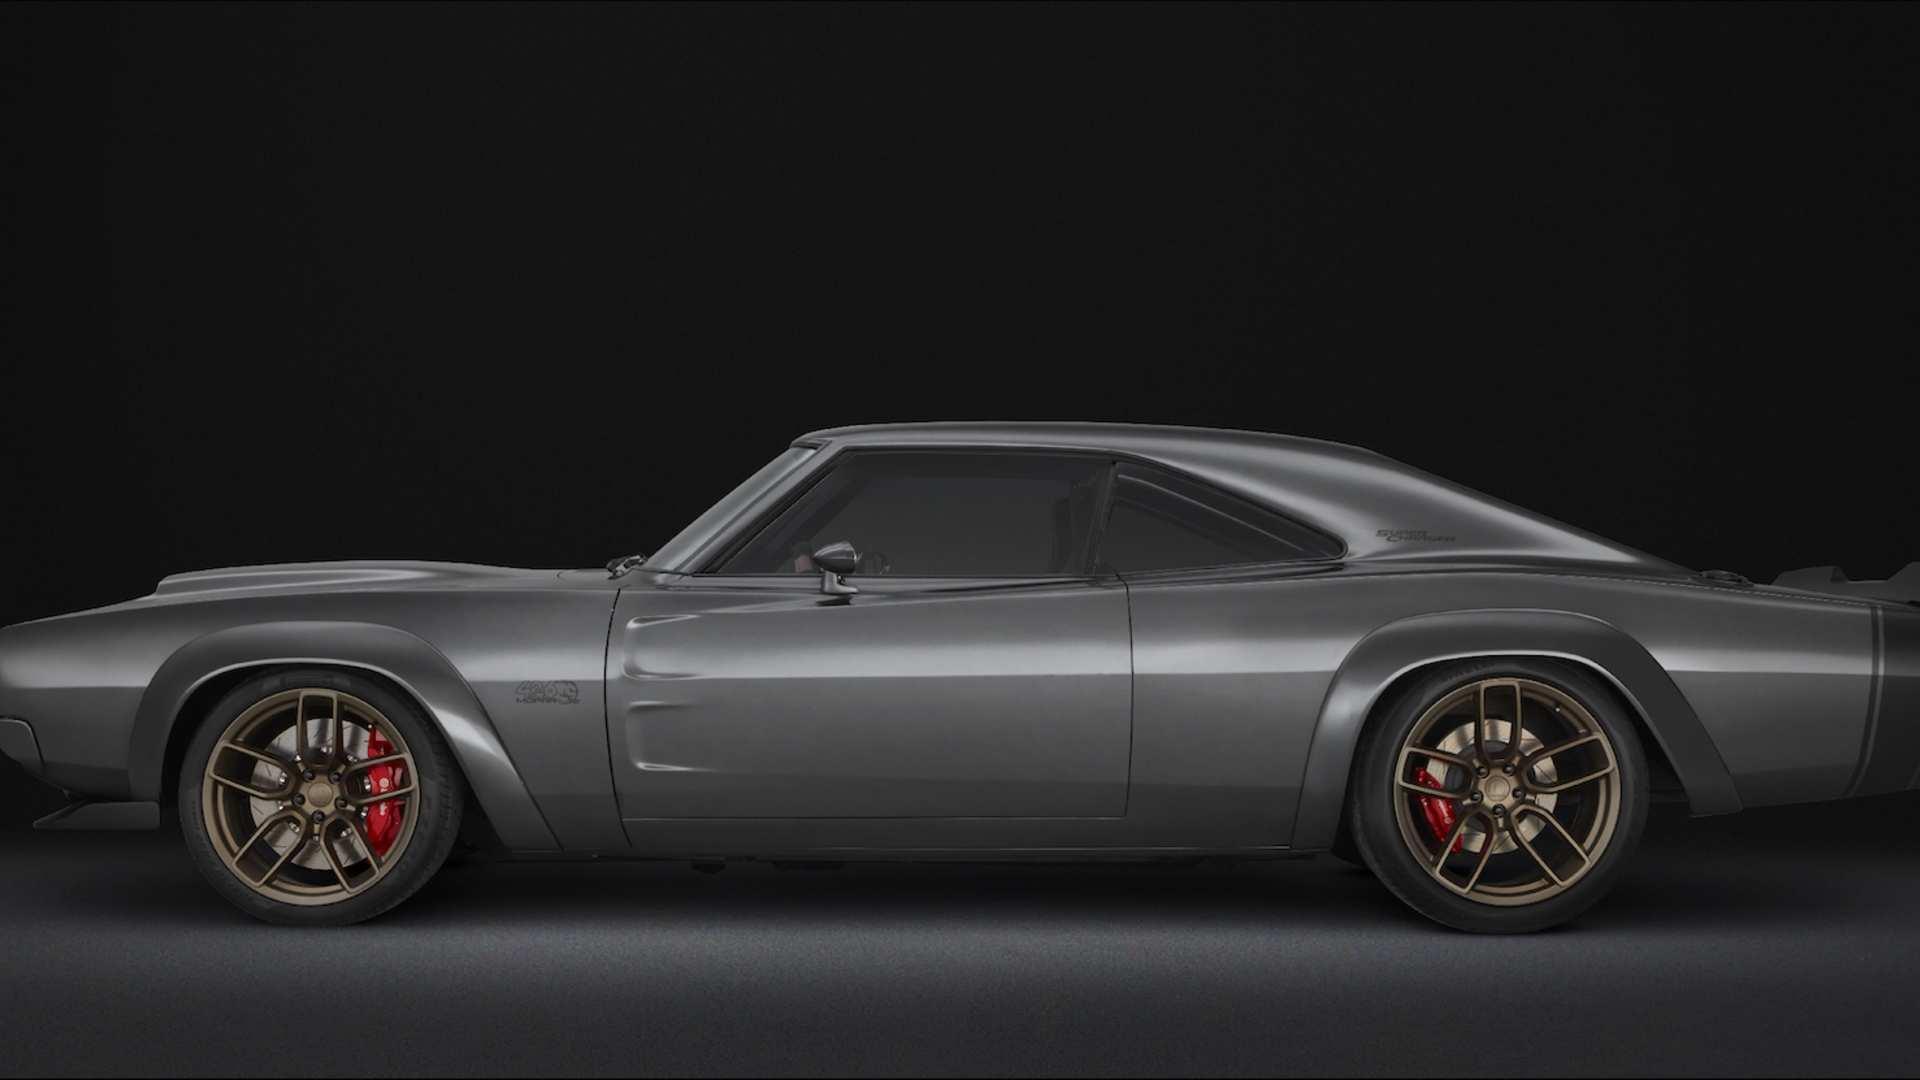 33 New 2020 Dodge Elephant Speed Test with 2020 Dodge Elephant